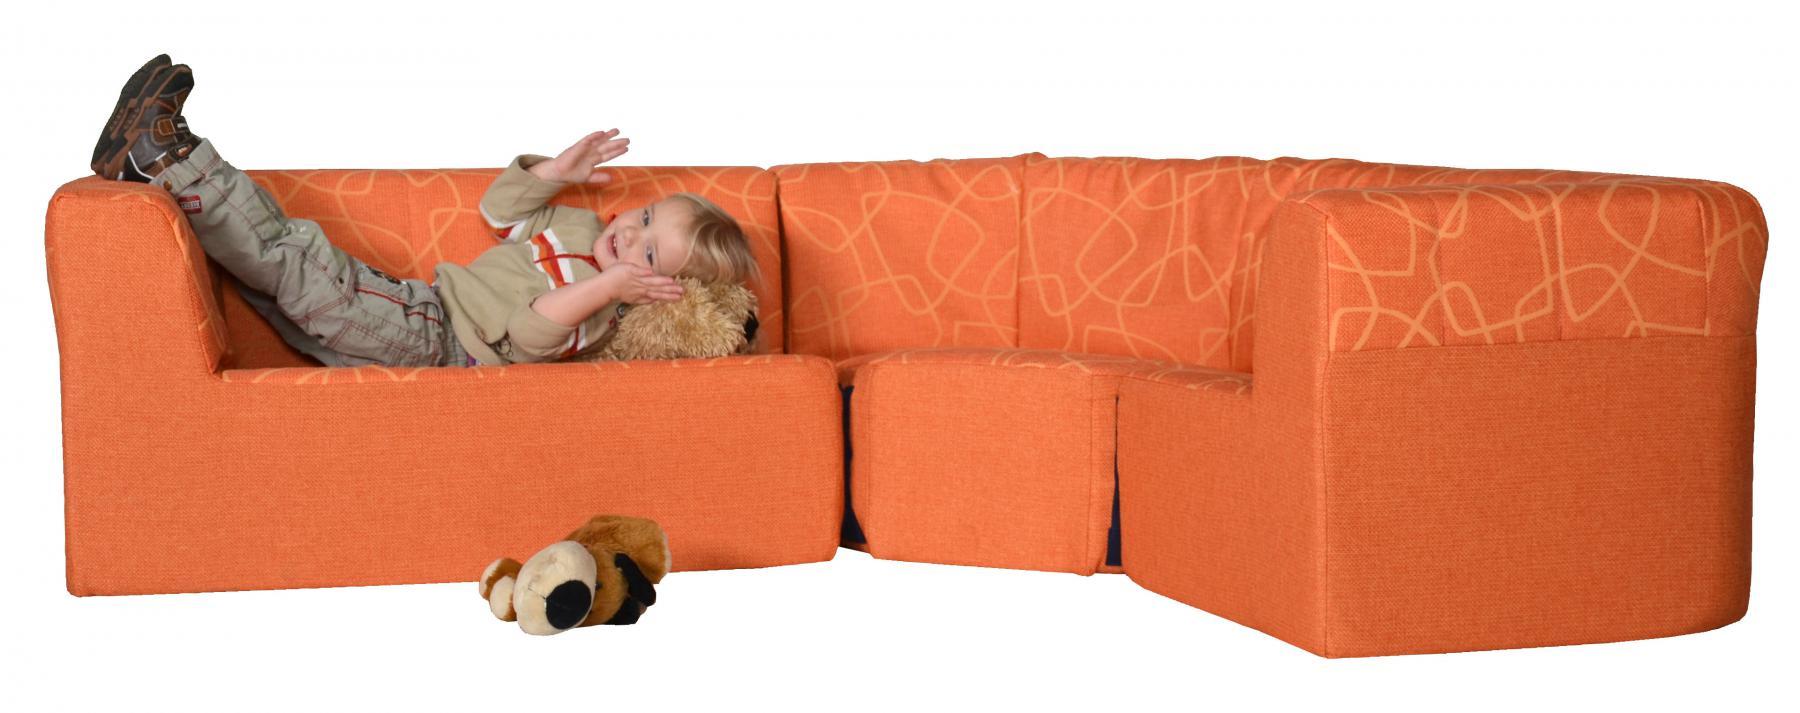 Bänfer Eckcouch Mini Sofa 3 Teilig Links Länger Couch Farbwahl